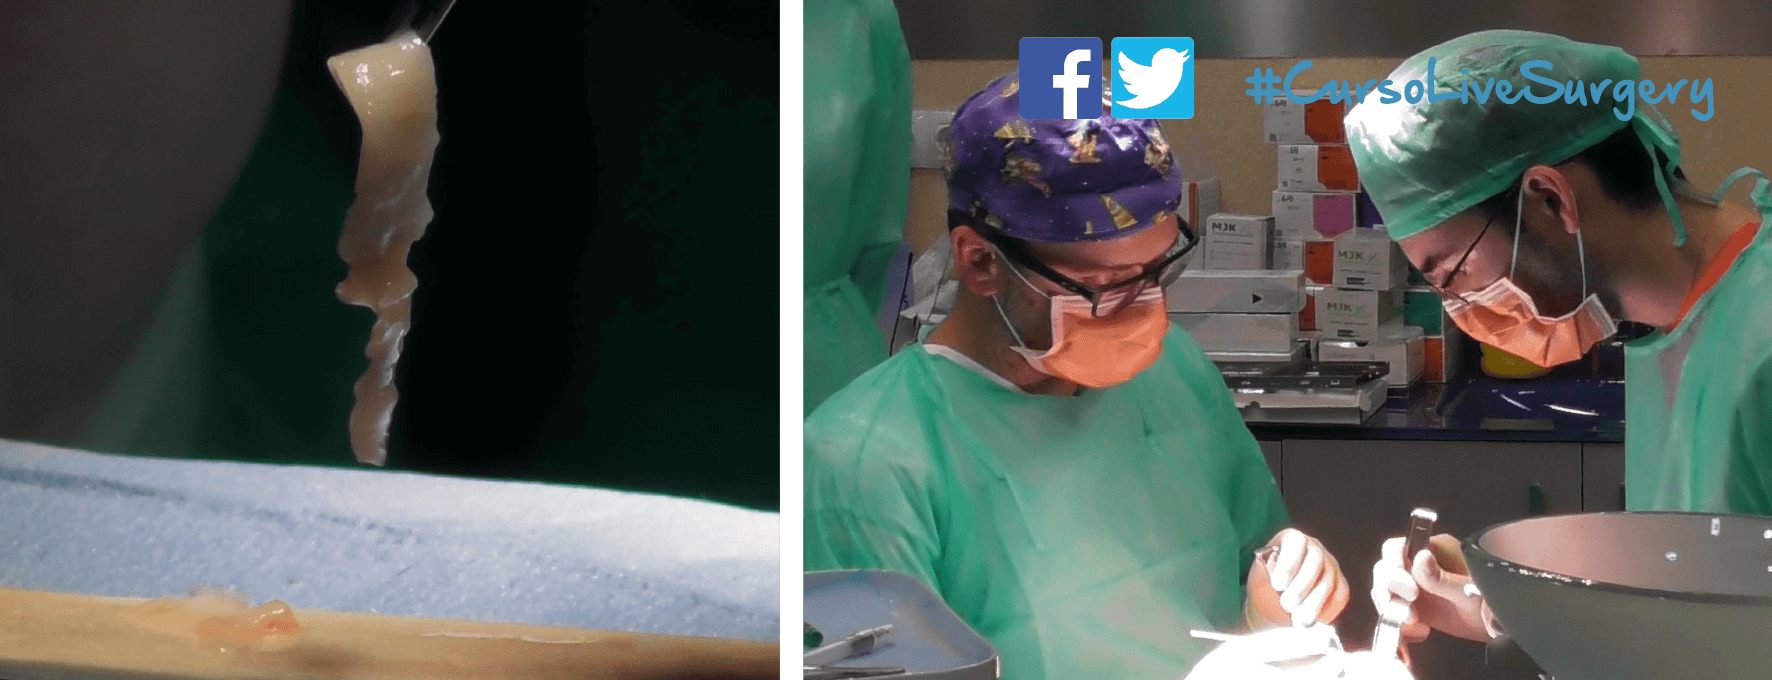 CirugiasEnDirecto